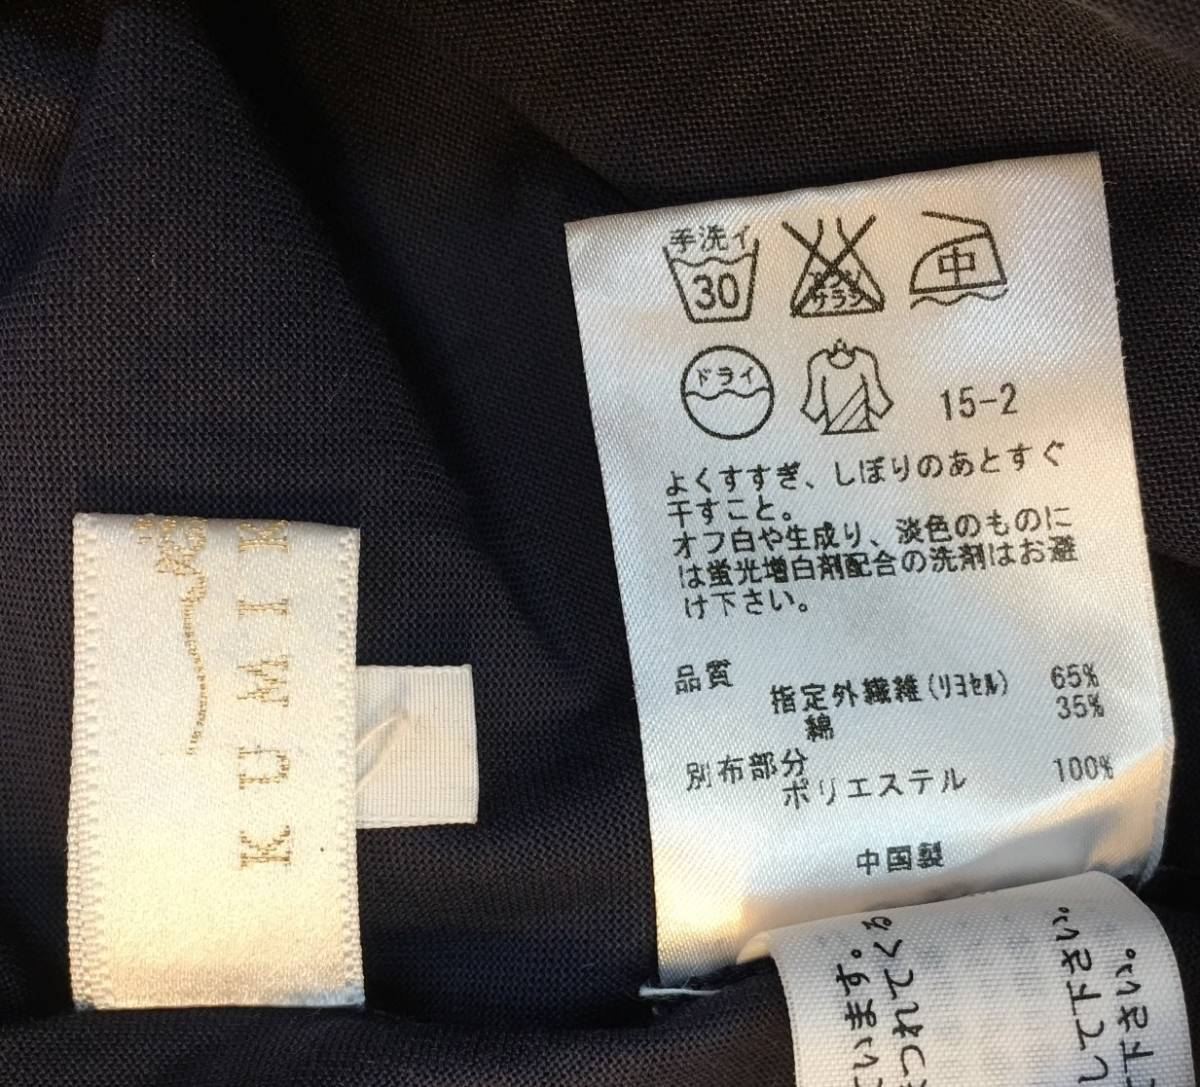 KUMIKYOKU 半袖 カットソー シフォン重ね レディース size 2 ネイビー トップス 組曲 19110602_画像5